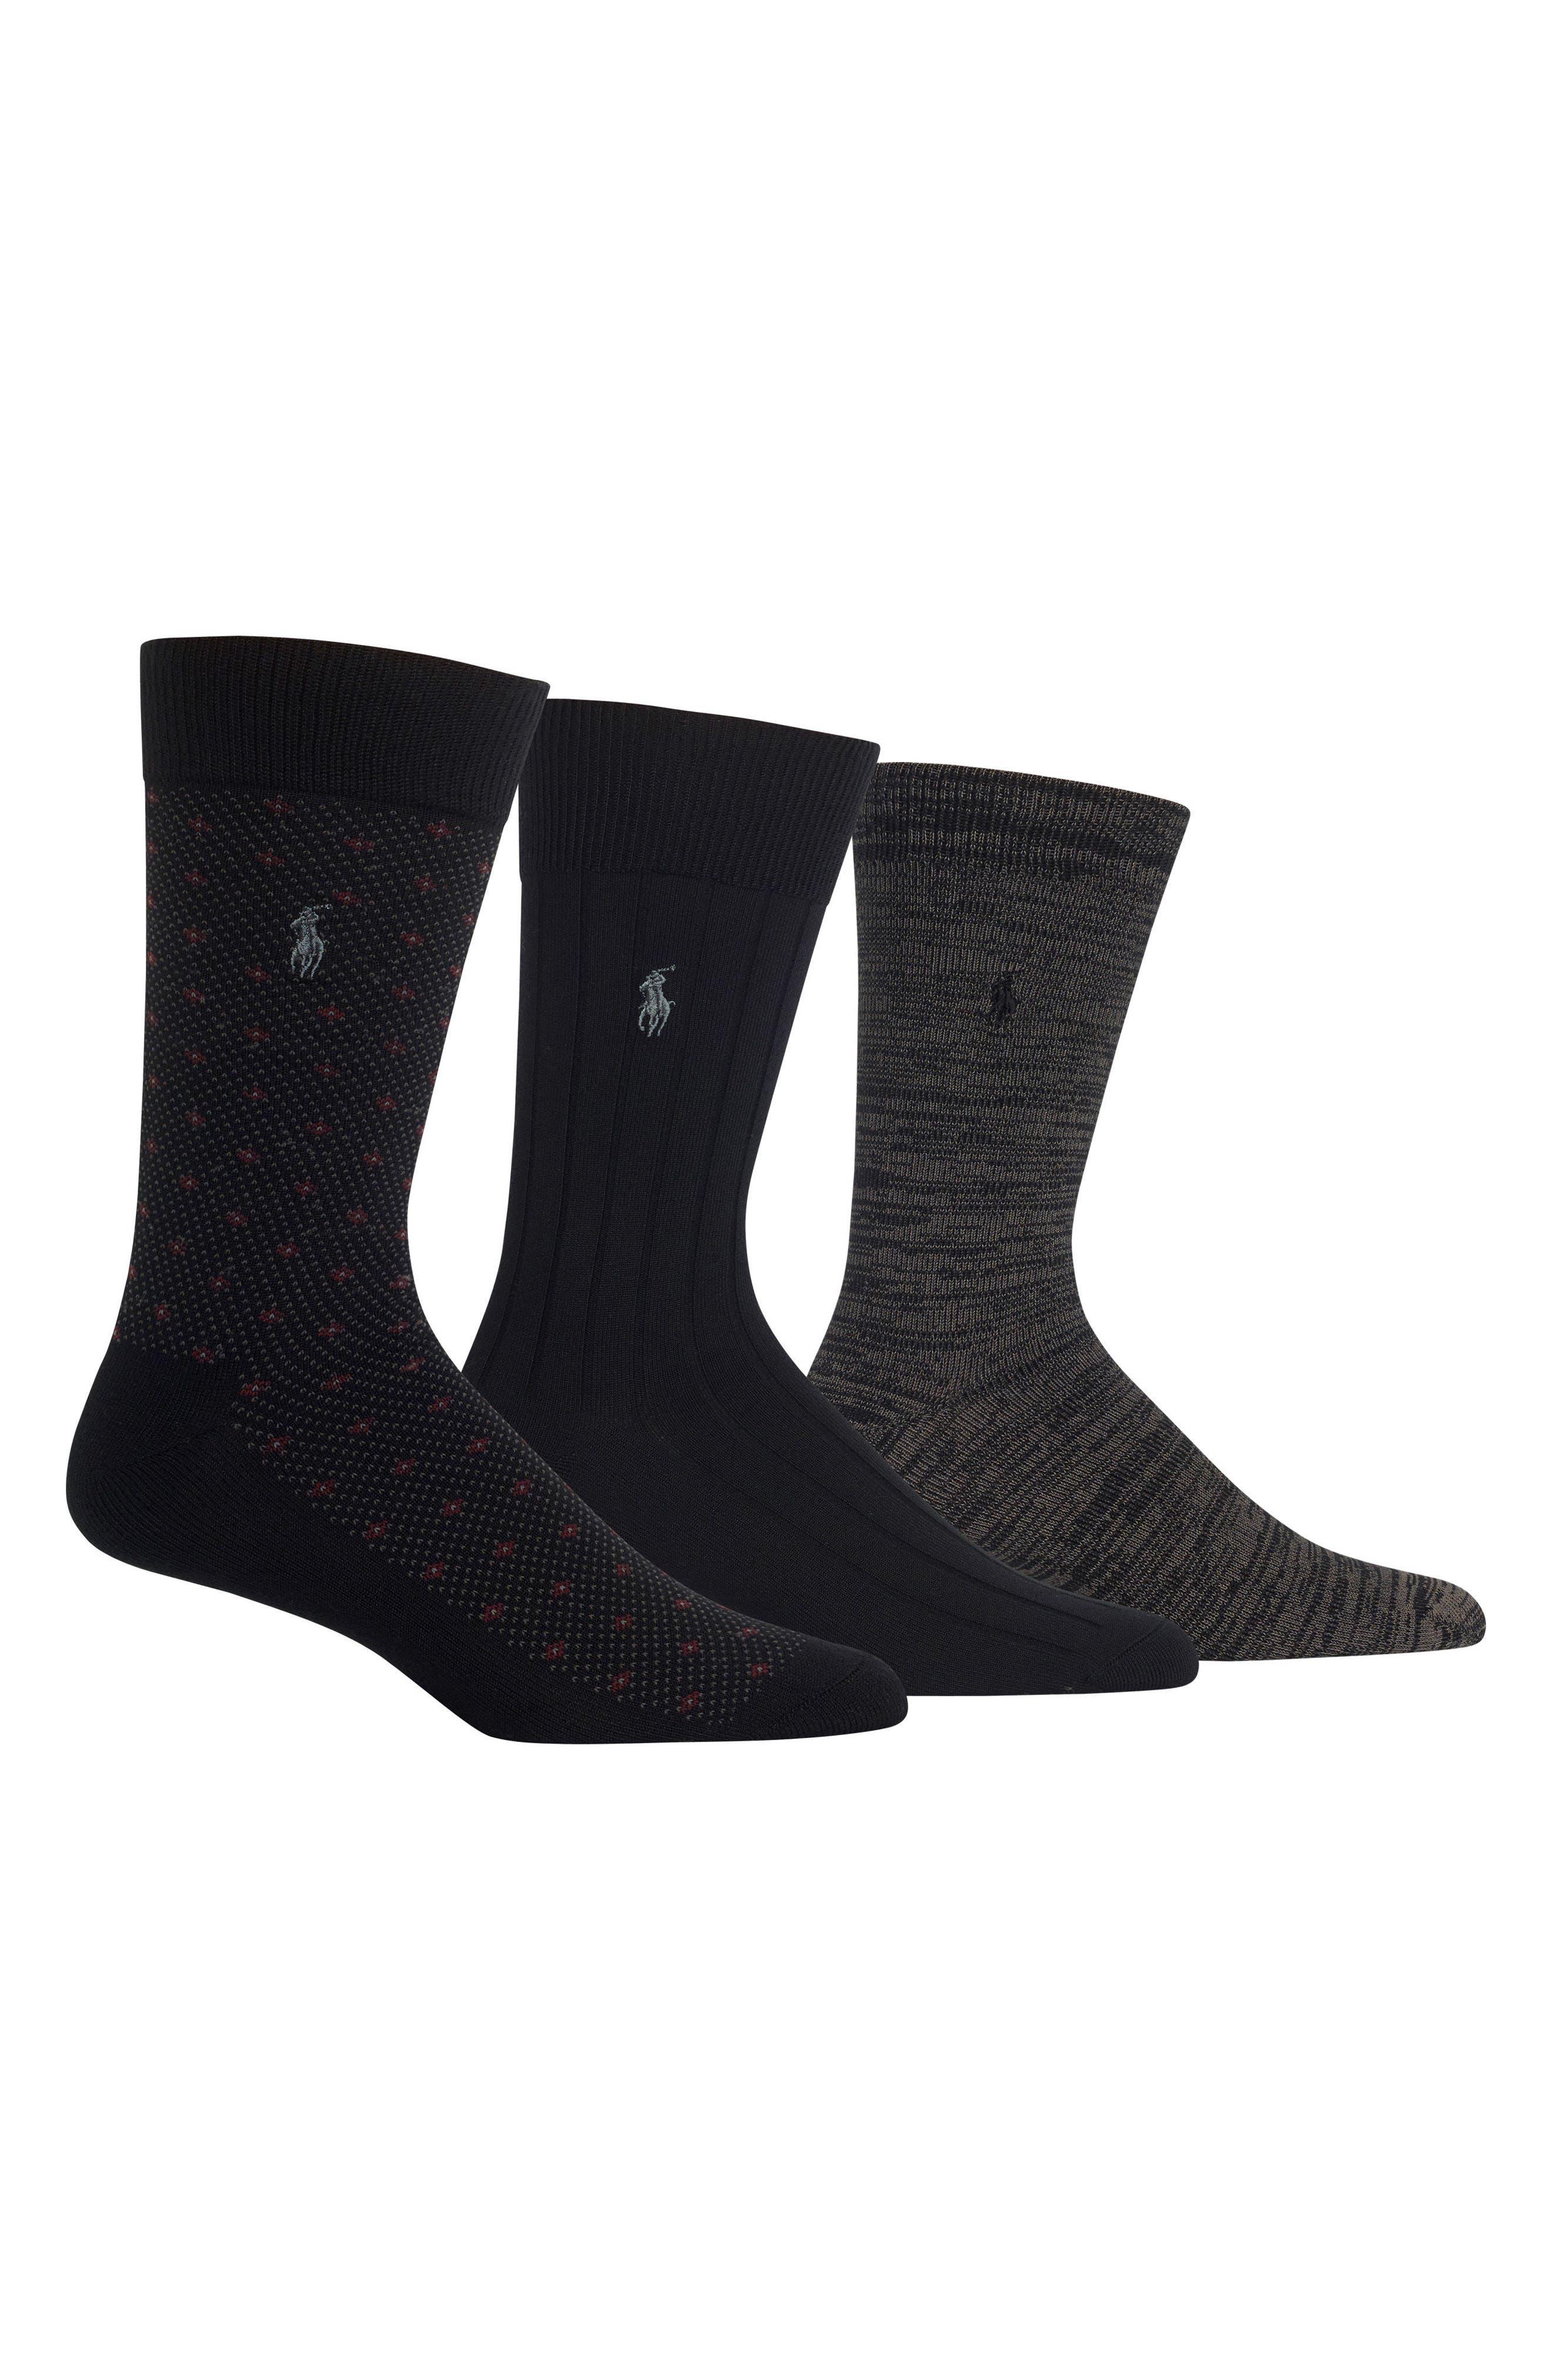 POLO RALPH LAUREN, Supersoft Diamond Dot Assorted 3-Pack Socks, Main thumbnail 1, color, BLACK